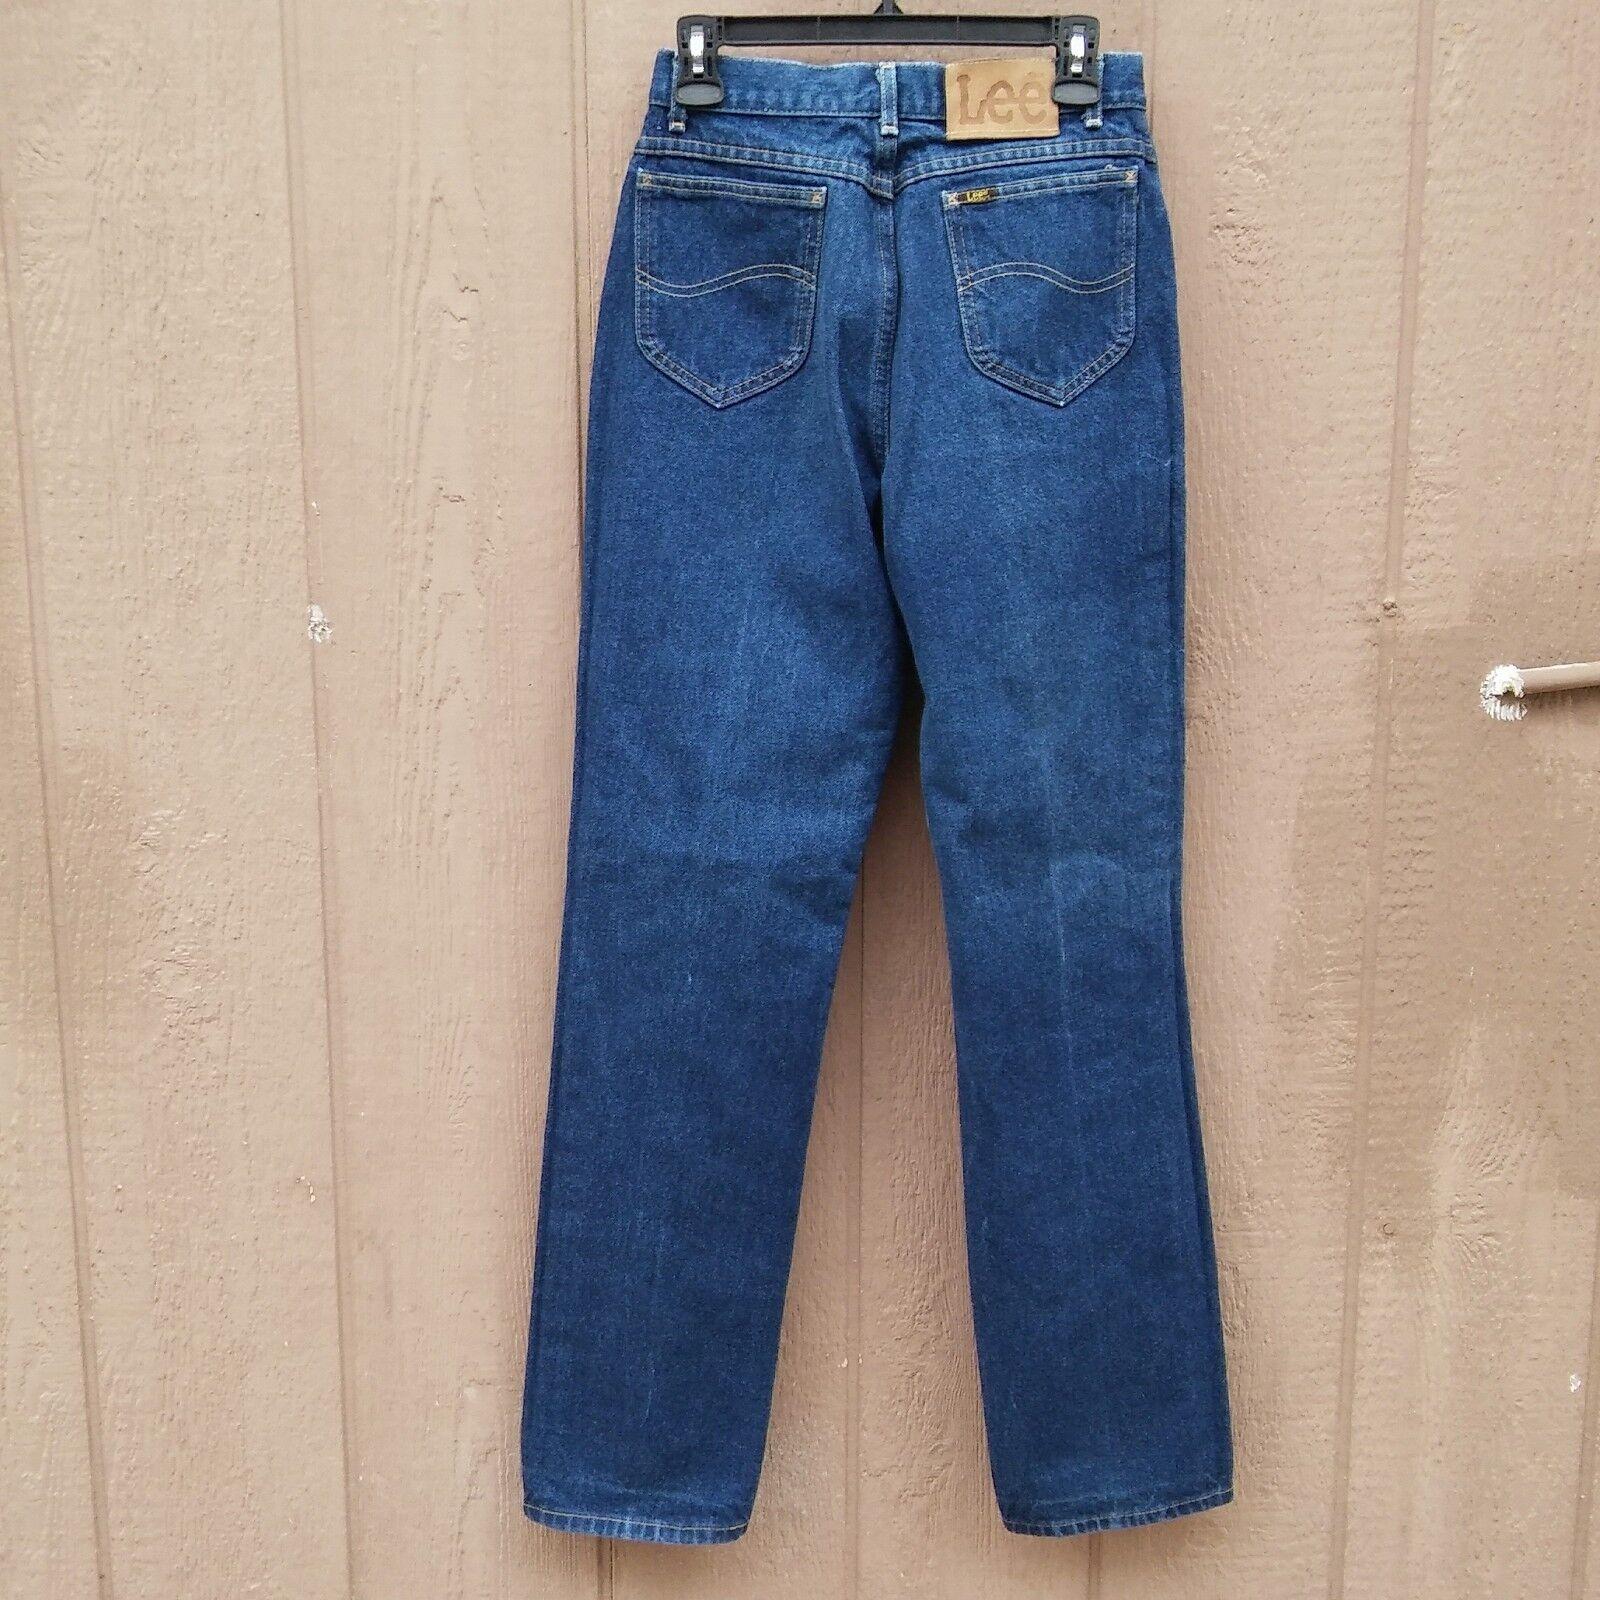 Lee  High Waist Women's Jeans Size 11